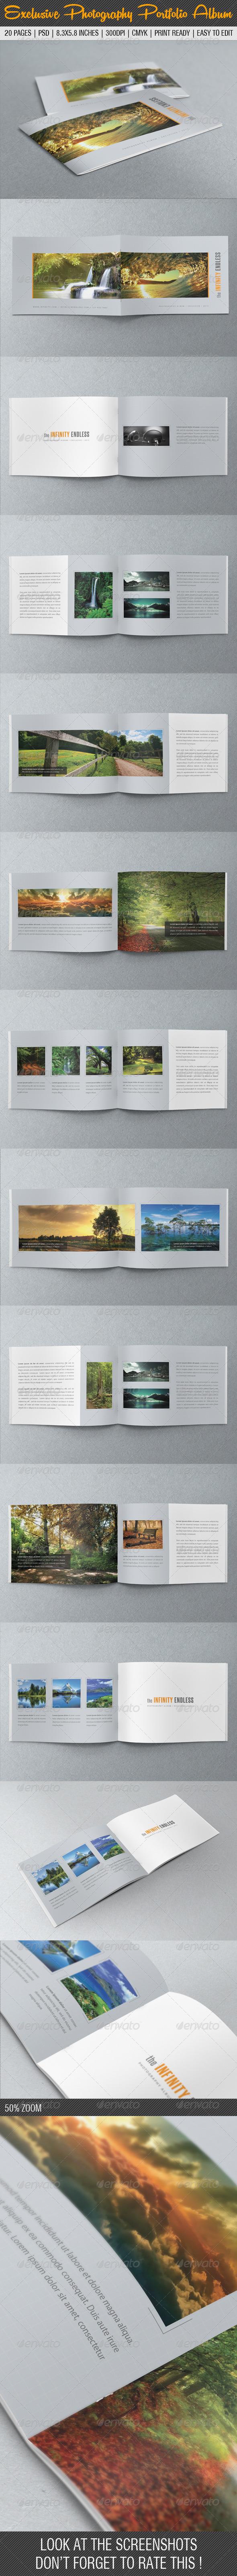 Exclusive Photography Portfolio Album - GraphicRiver